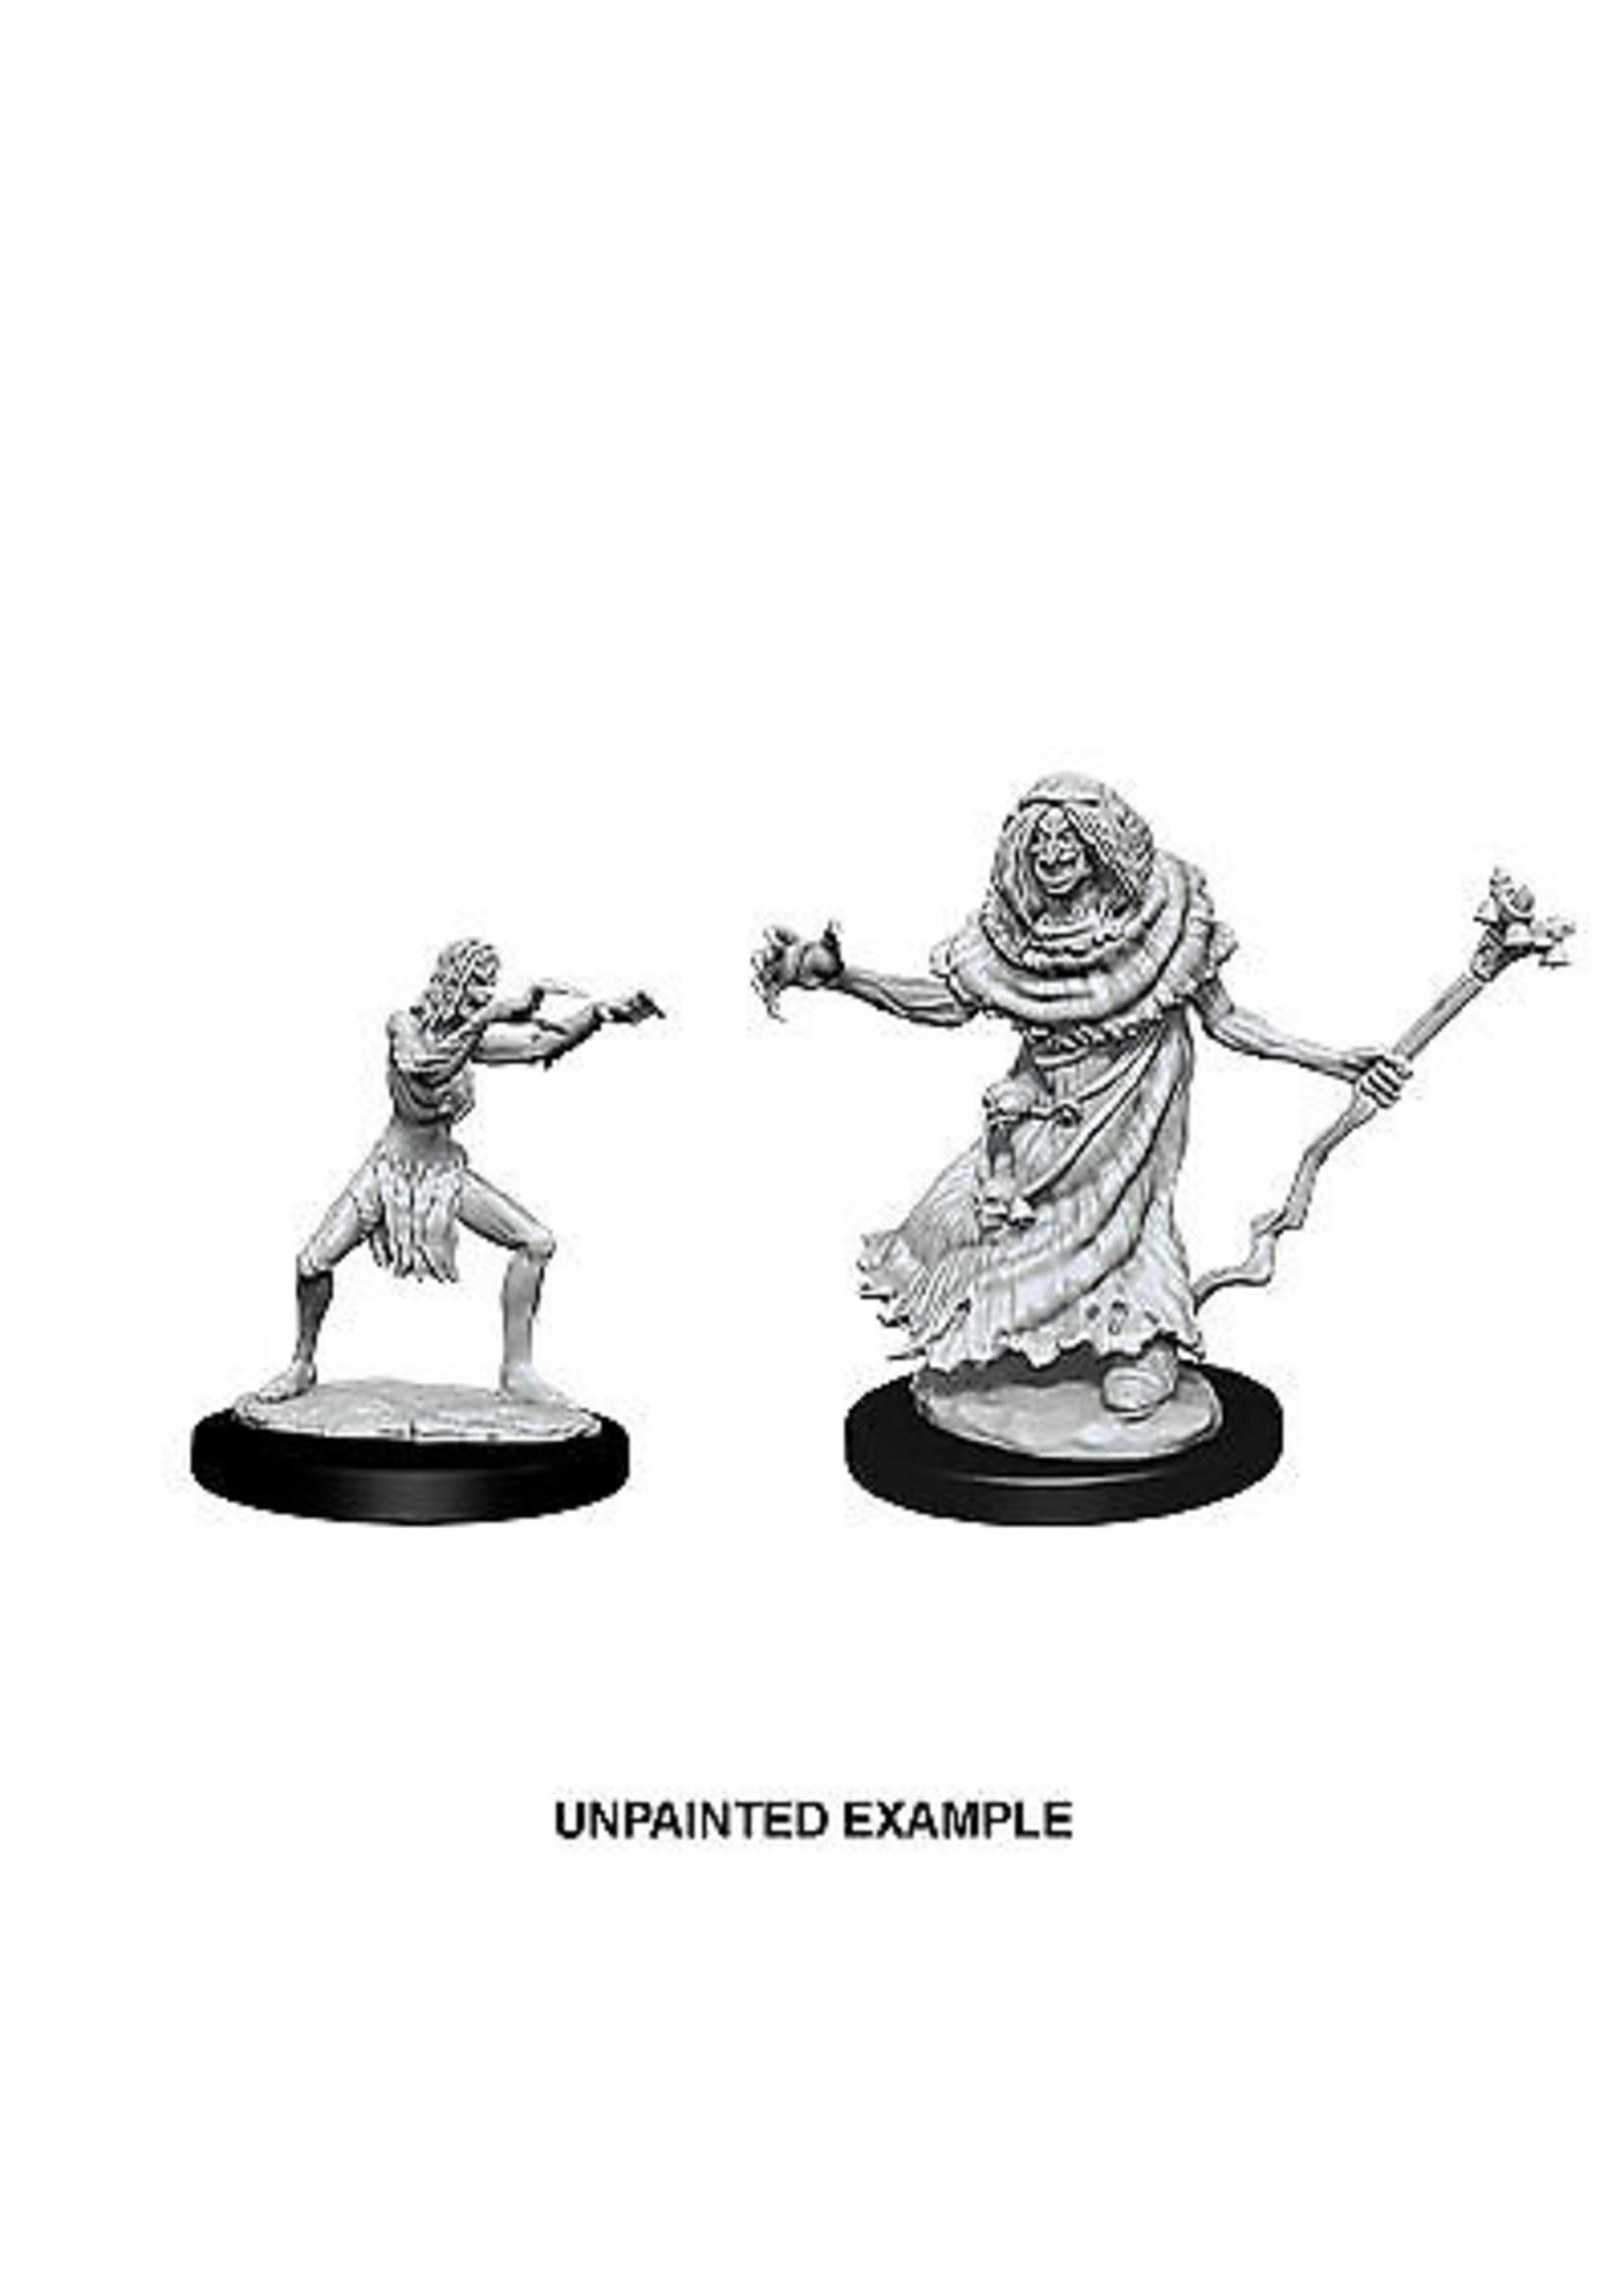 Dungeons & Dragons Nolzur`s Marvelous Unpainted Miniatures: W12 Sea Hag & Bheur Hag